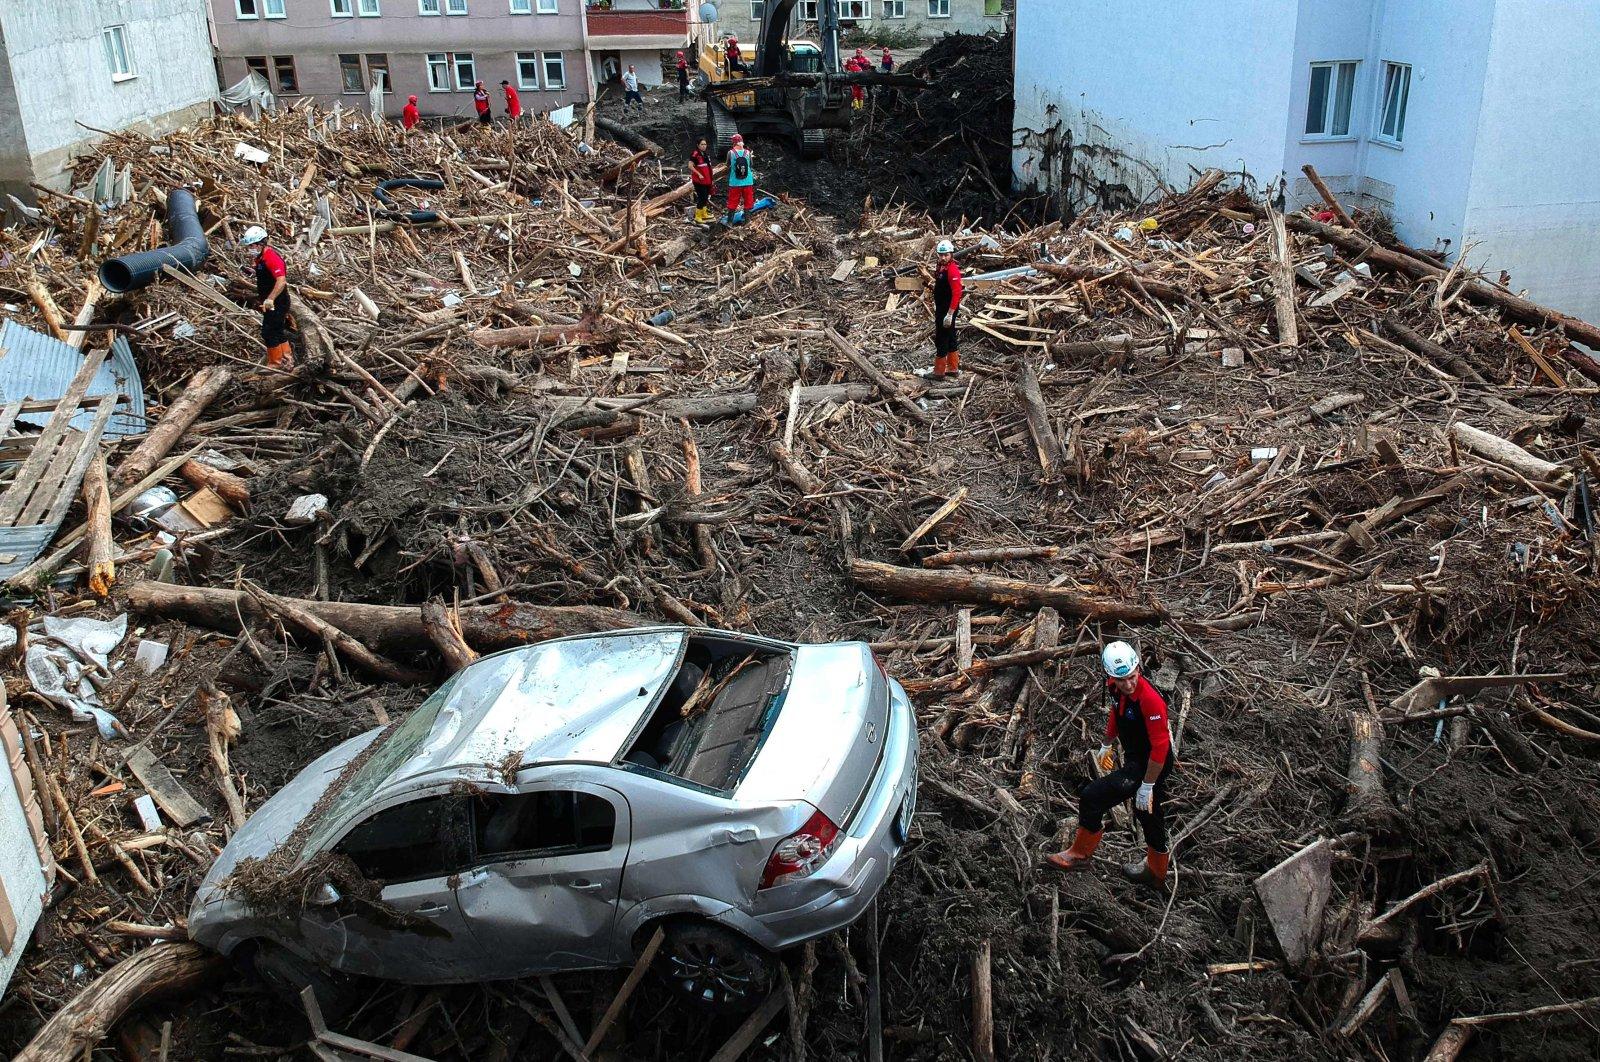 Rescuers look through the debris following flash floods in Bozkurt, in Kastamonu, northern Turkey, Aug. 15, 2021. (AFP Photo)